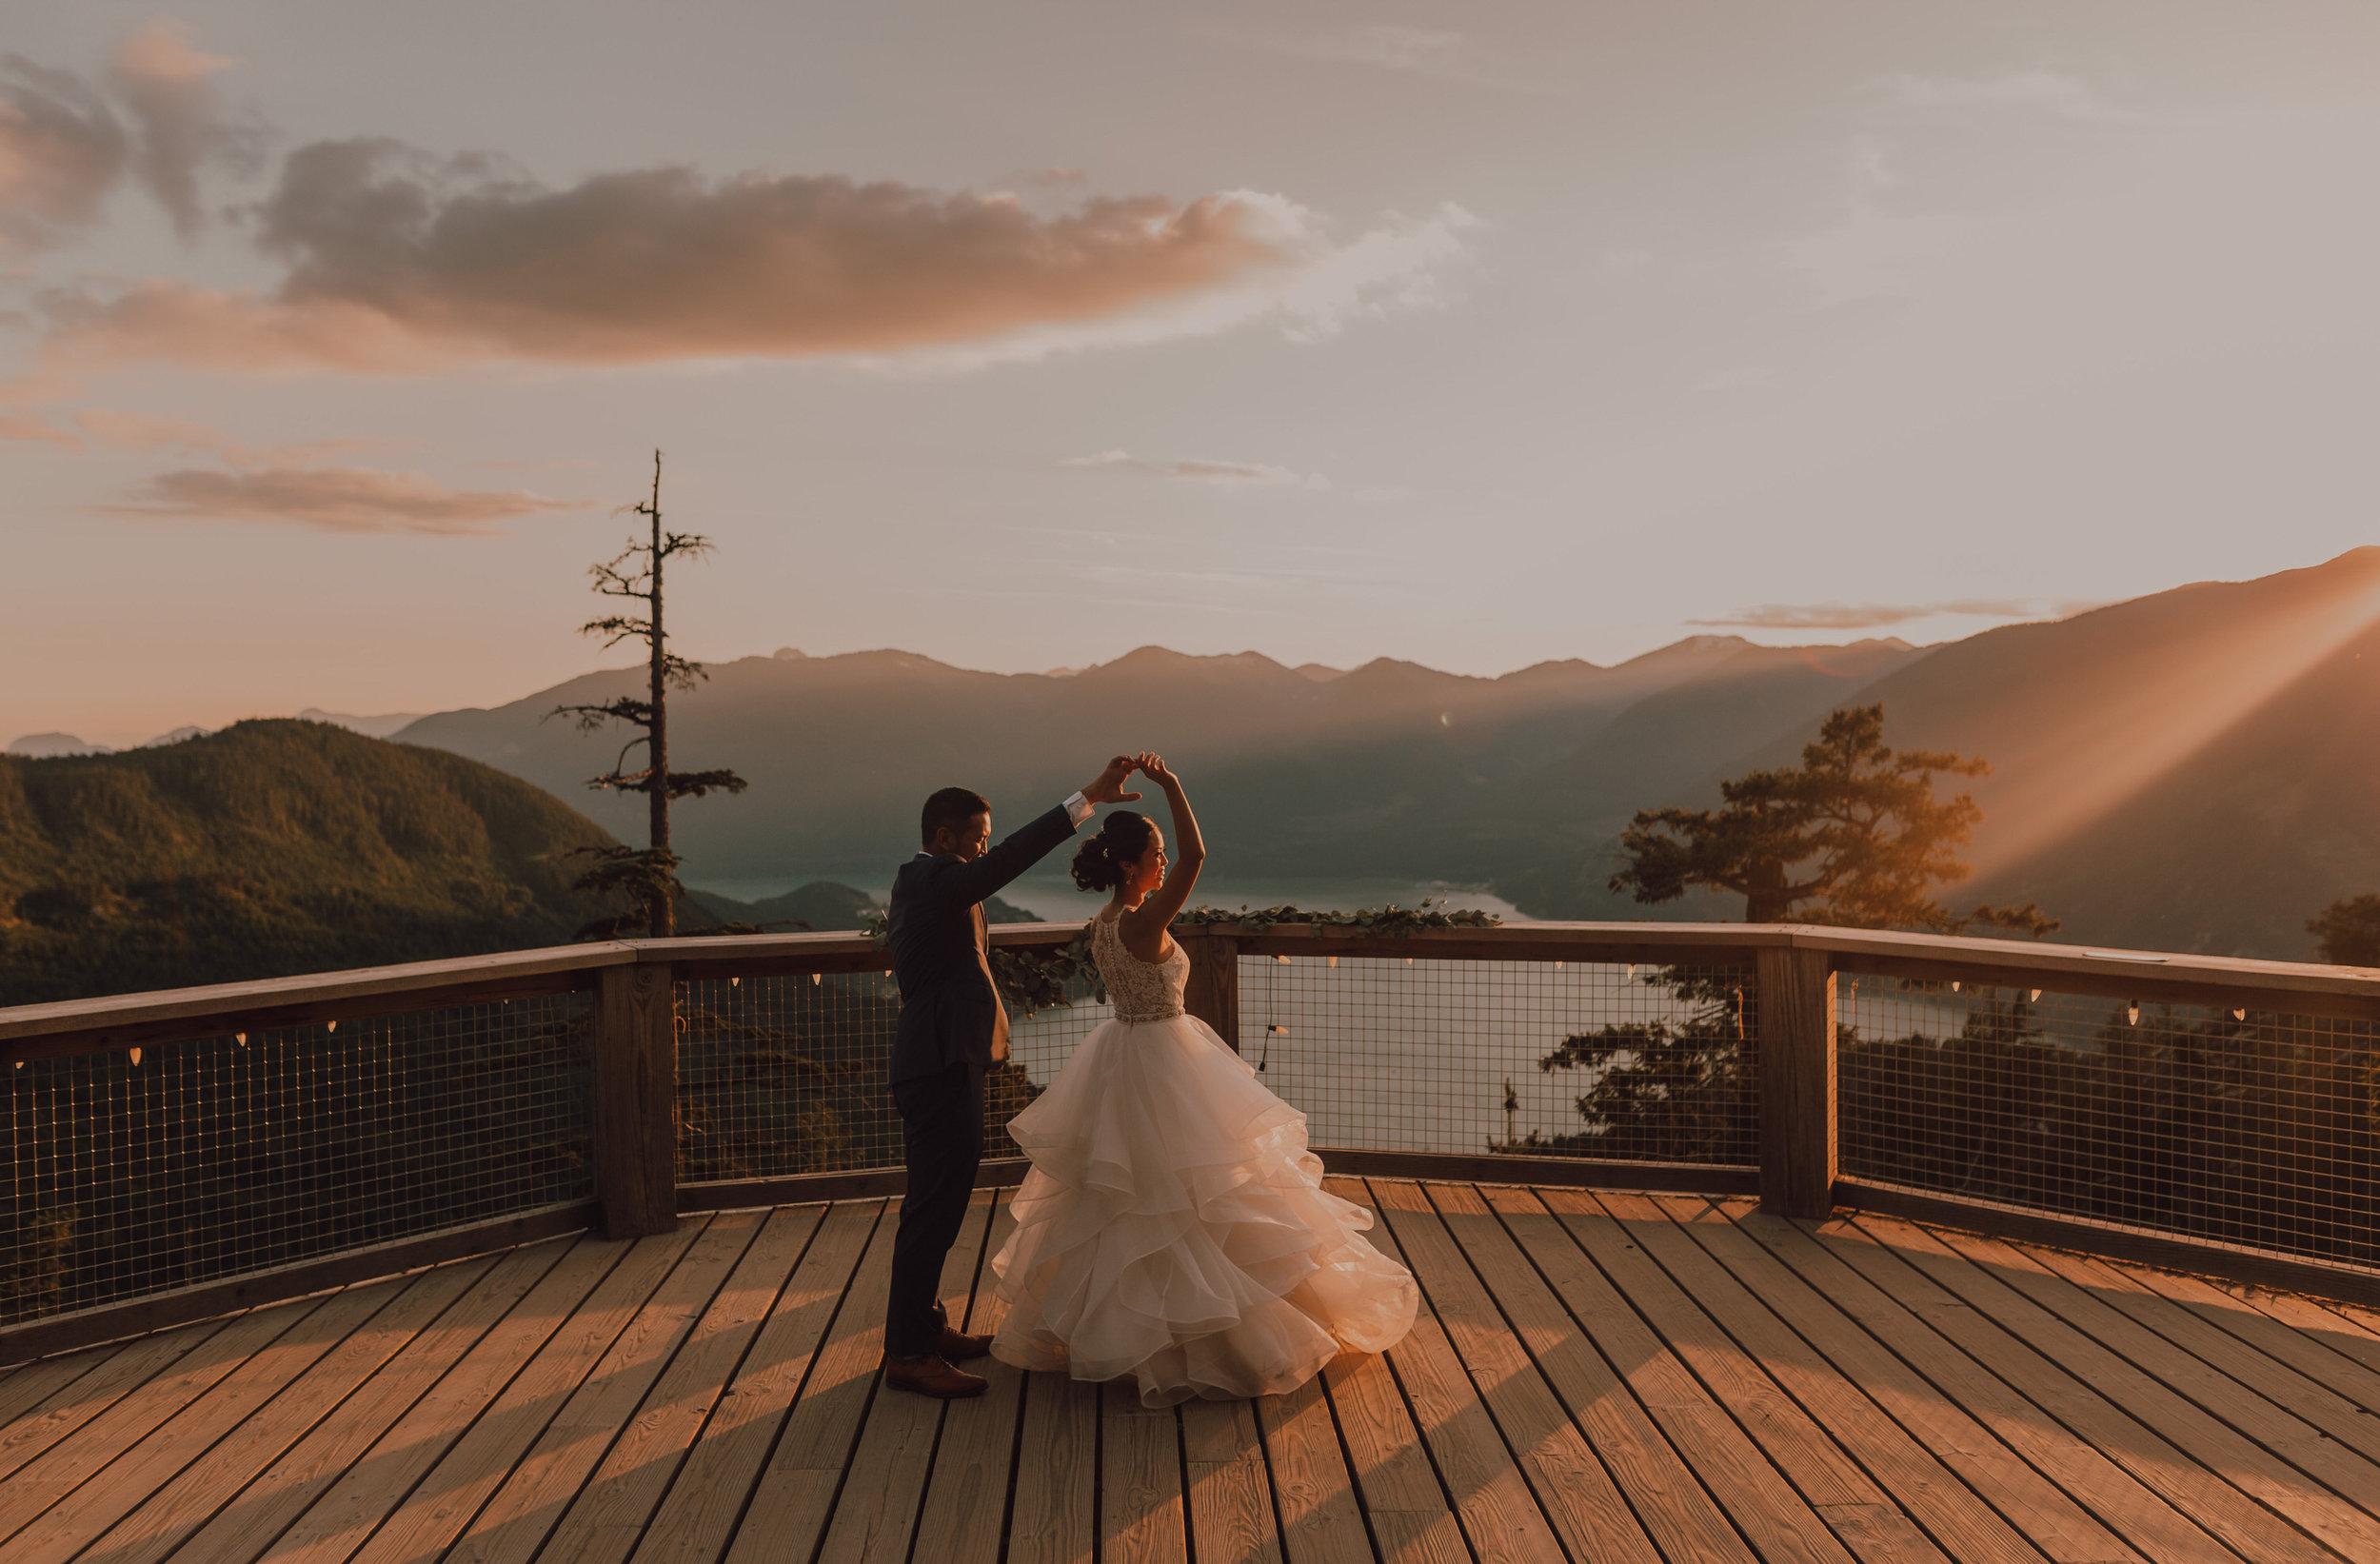 Squamish Wedding Photographer - Sea to Sky Gondola Wedding Photos -  Vancouver Wedding Photographer & Videographer - Sunshine Coast Wedding Photos - Sunshine Coast Wedding Photographer - Jennifer Picard Photography - IMG_5157.jpg